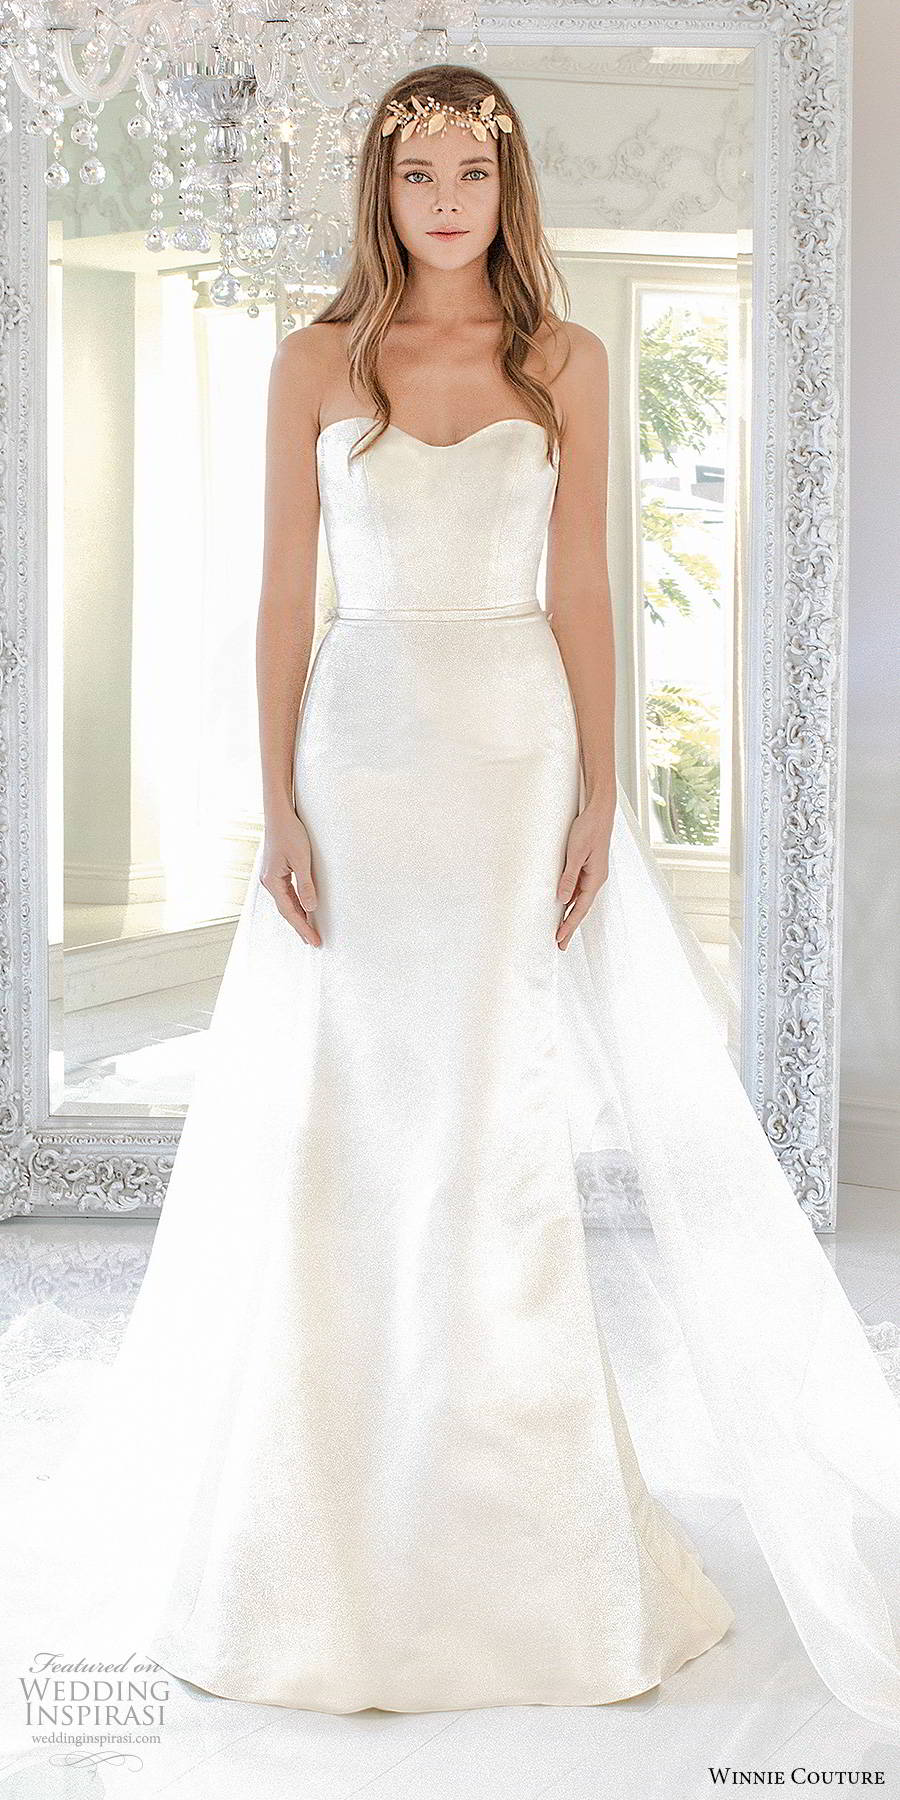 winnie couture 2019 bridal strapless semi sweetheart neckline elegant minimalist clean mermaid sheath wedding dress a line overskirt chapel train (17) mv